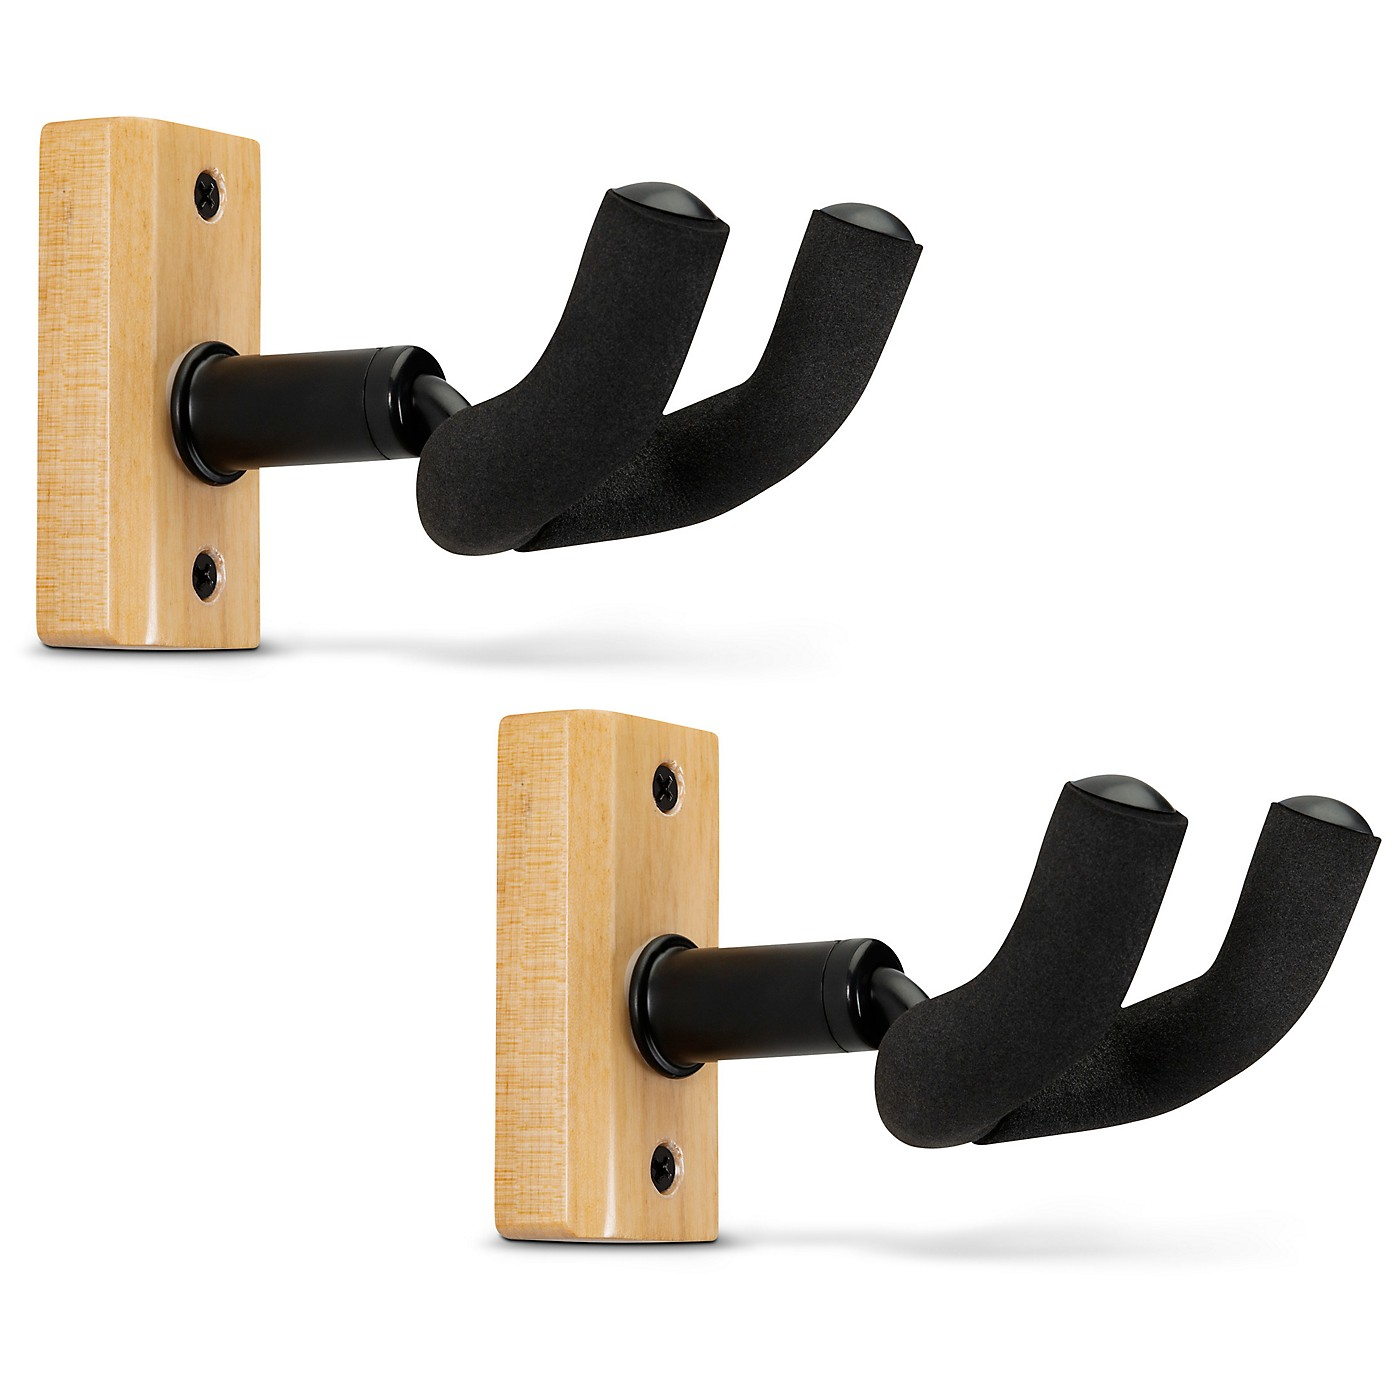 Proline Solid Wood Guitar Hanger - Natural, 2-Pack thumbnail